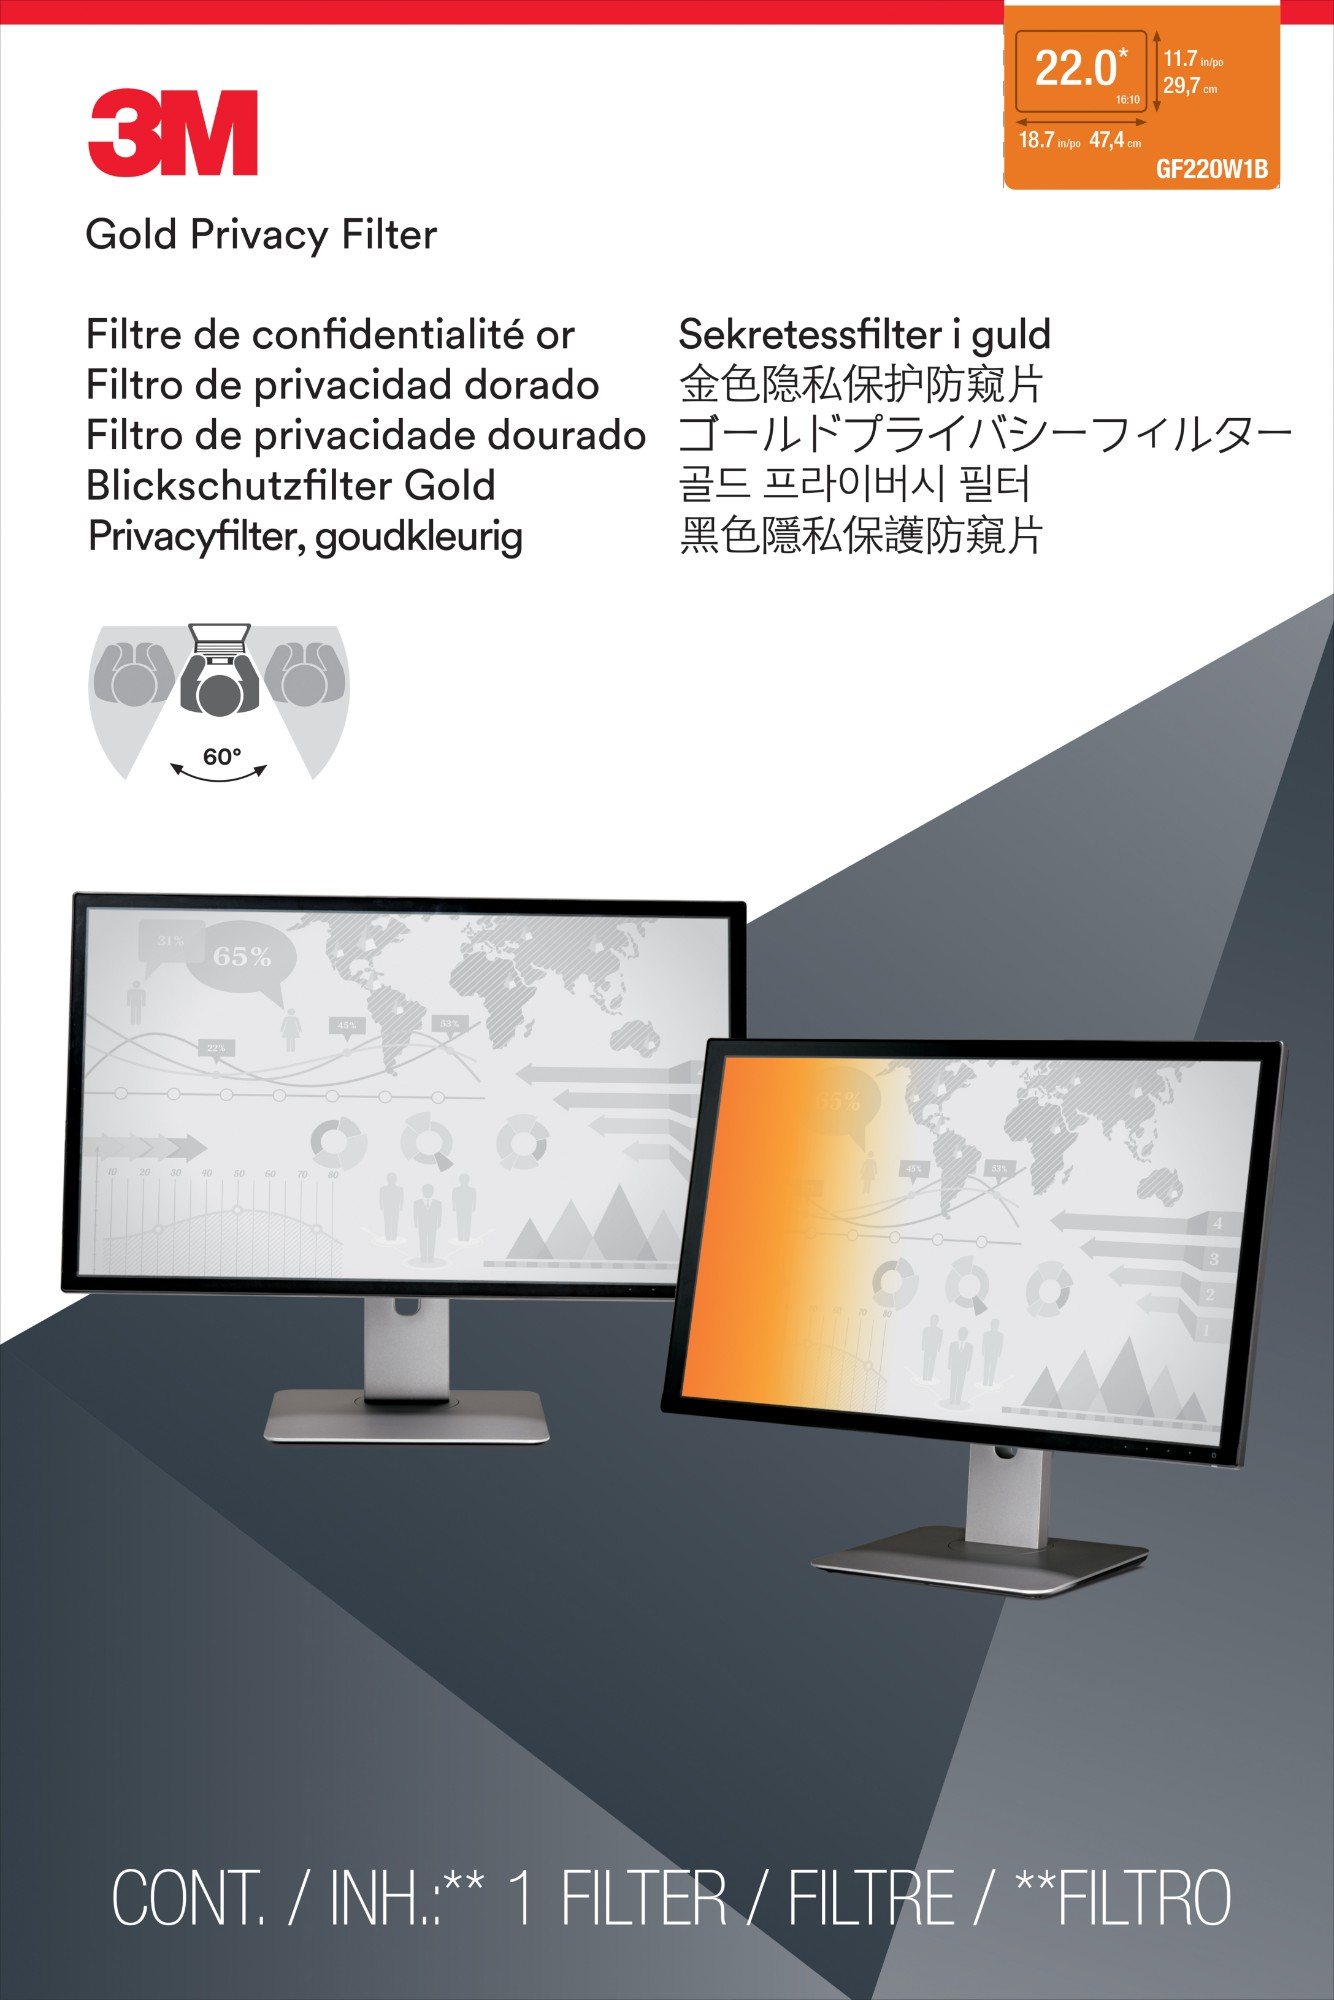 Privacy Flt 22in Ws 16:9 Gold Dt Laptop Gf220w1b